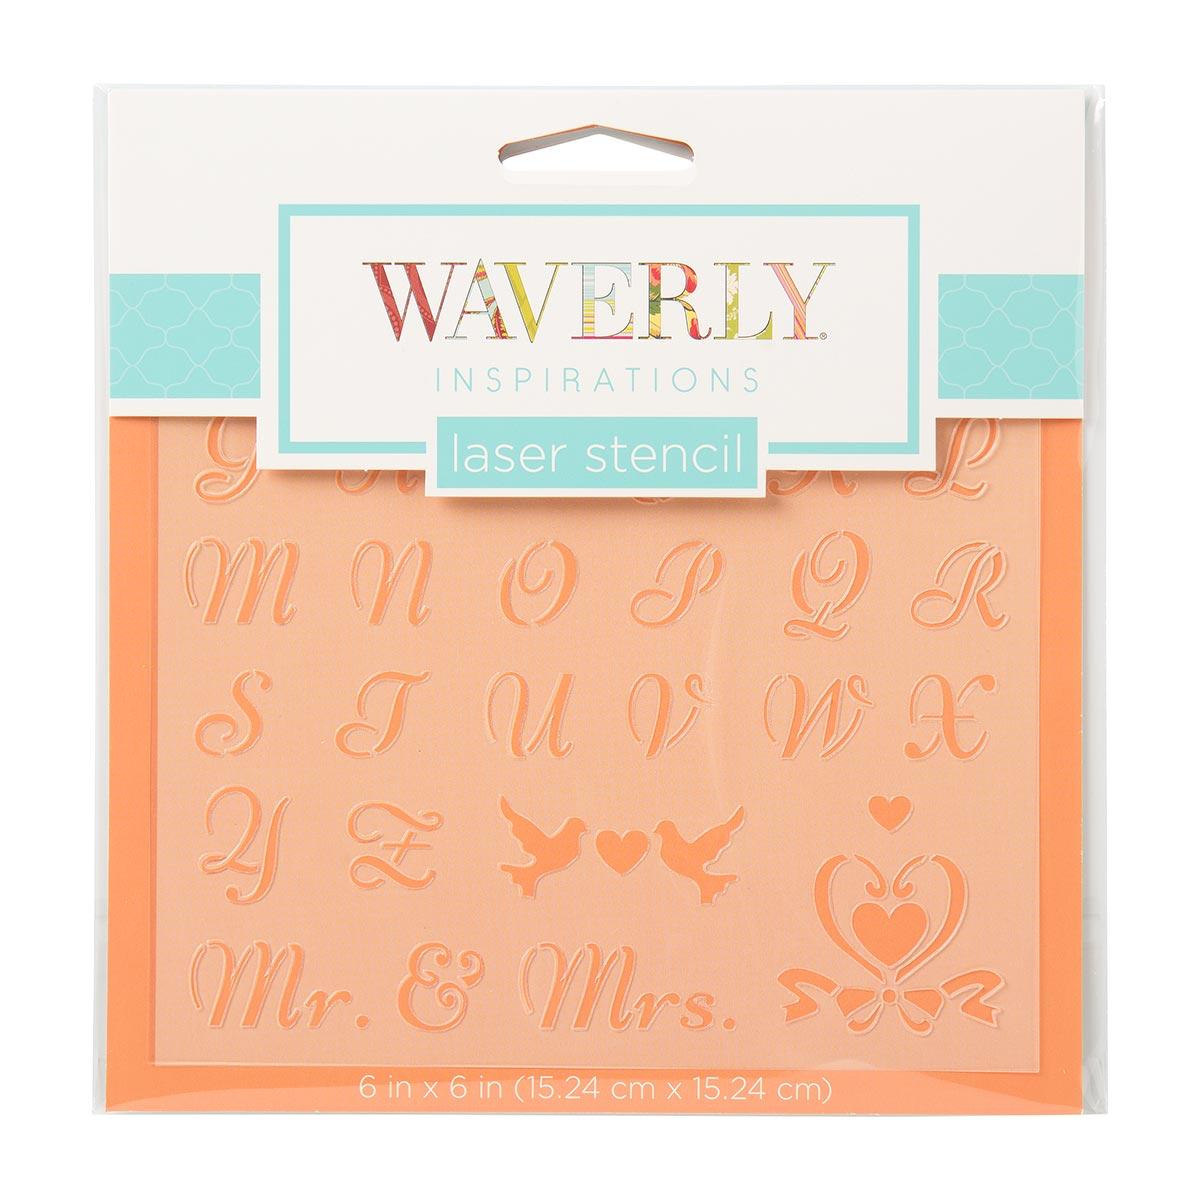 Waverly ® Inspirations Laser Stencils - Accent - Alpha Fancy, 6